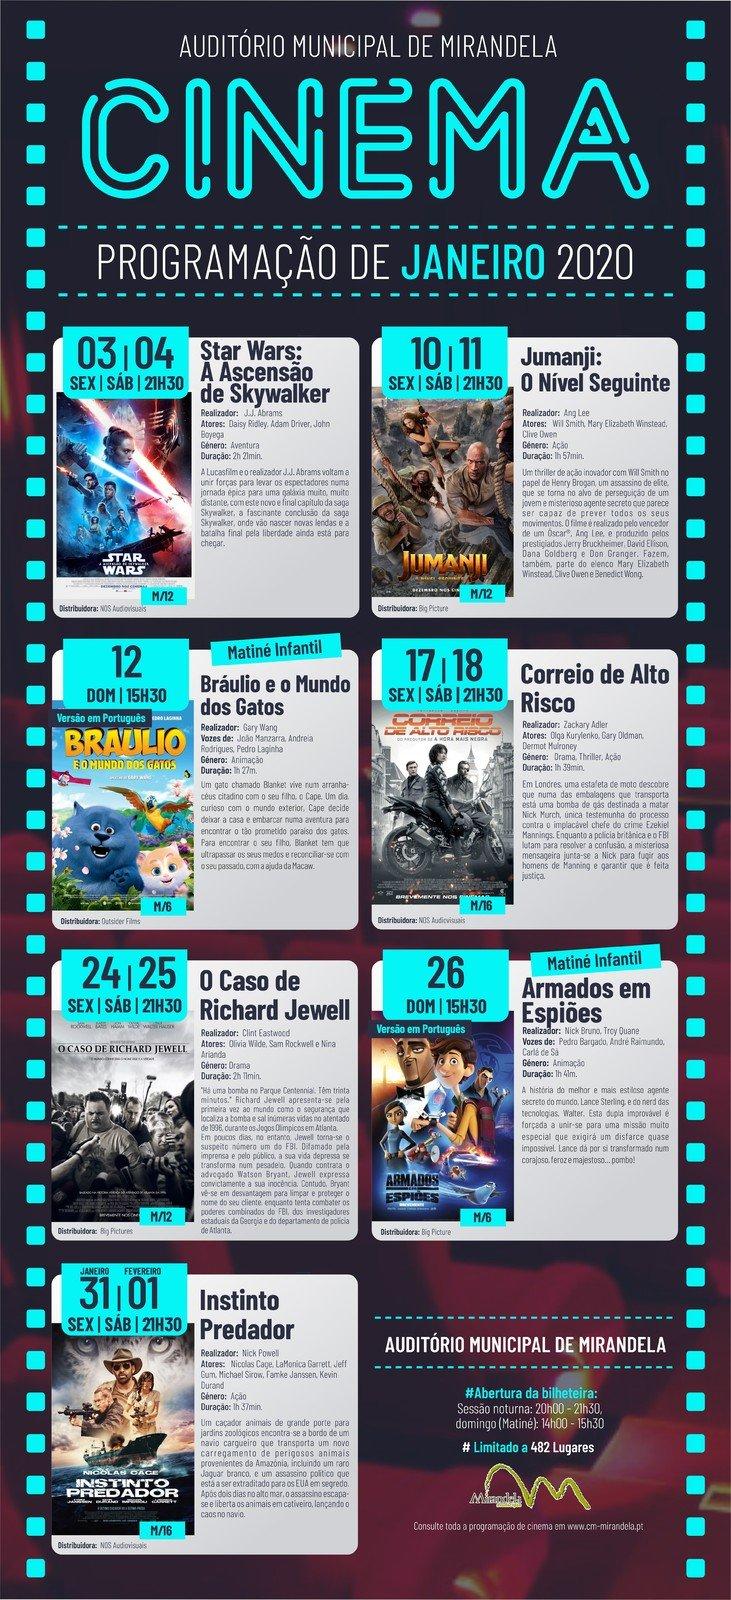 Cinema: Janeiro 2020